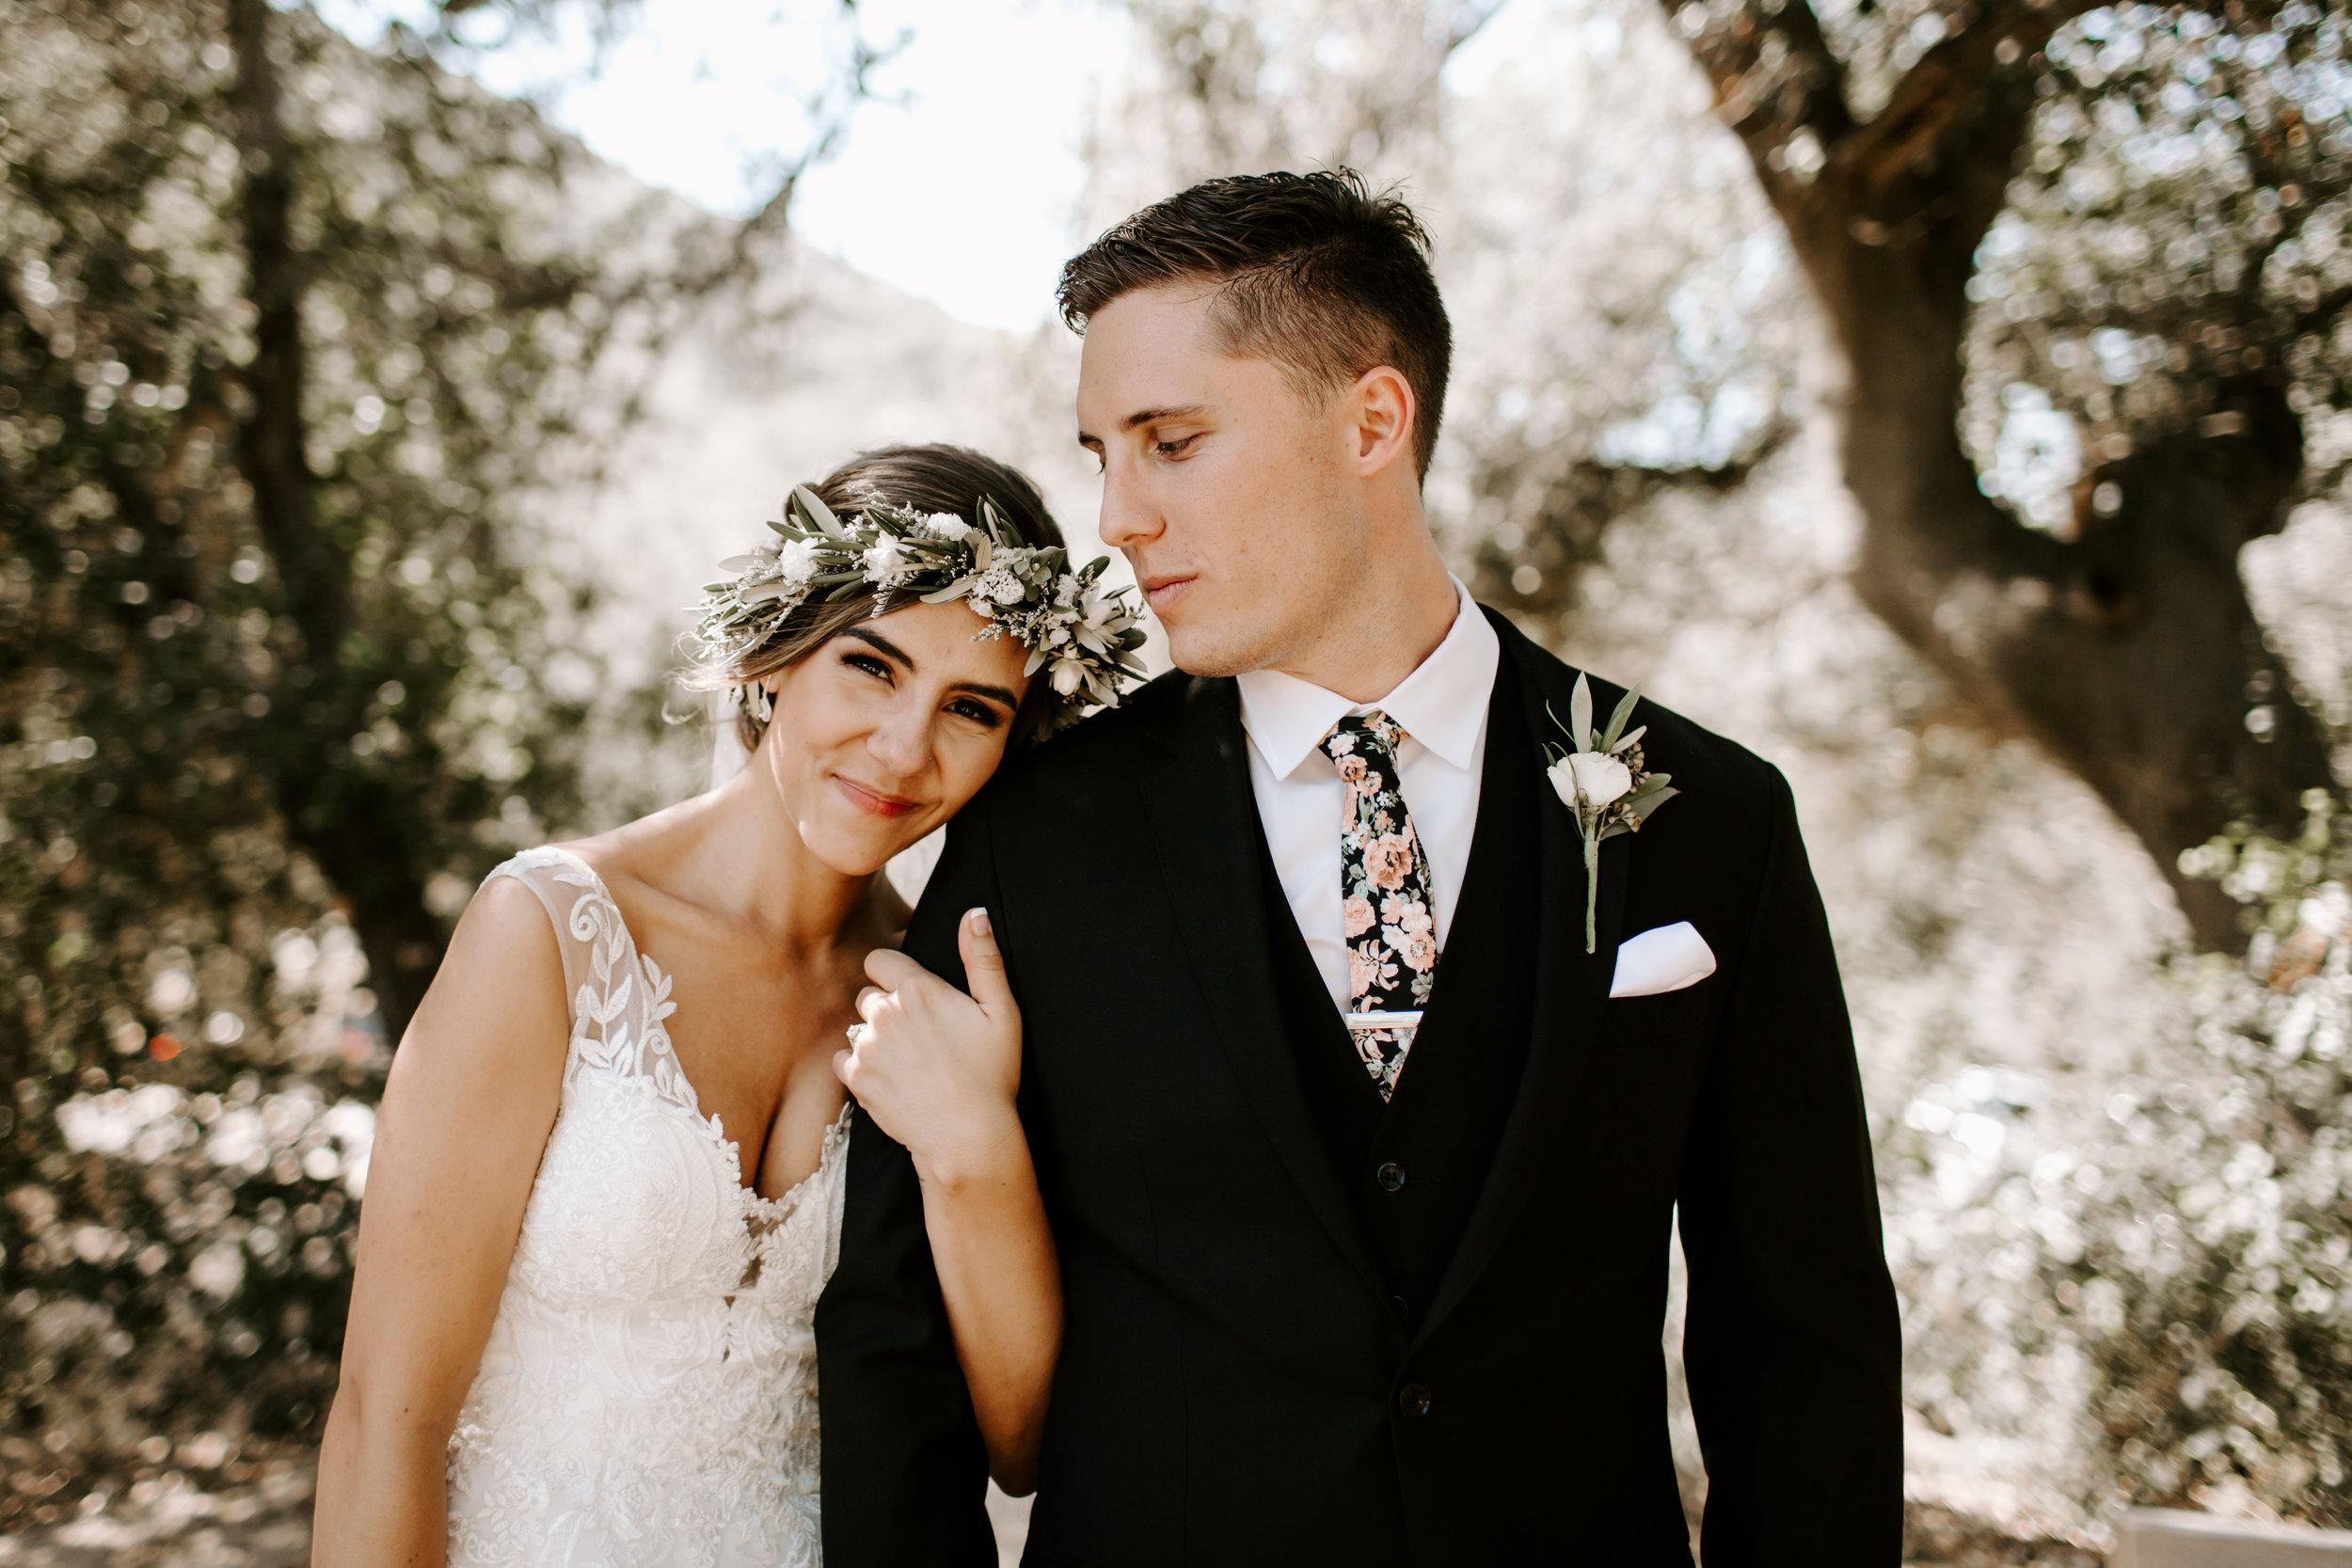 kate+zack_wedding_secludedgardenestate_temecula_madisonrylee_0629.jpg